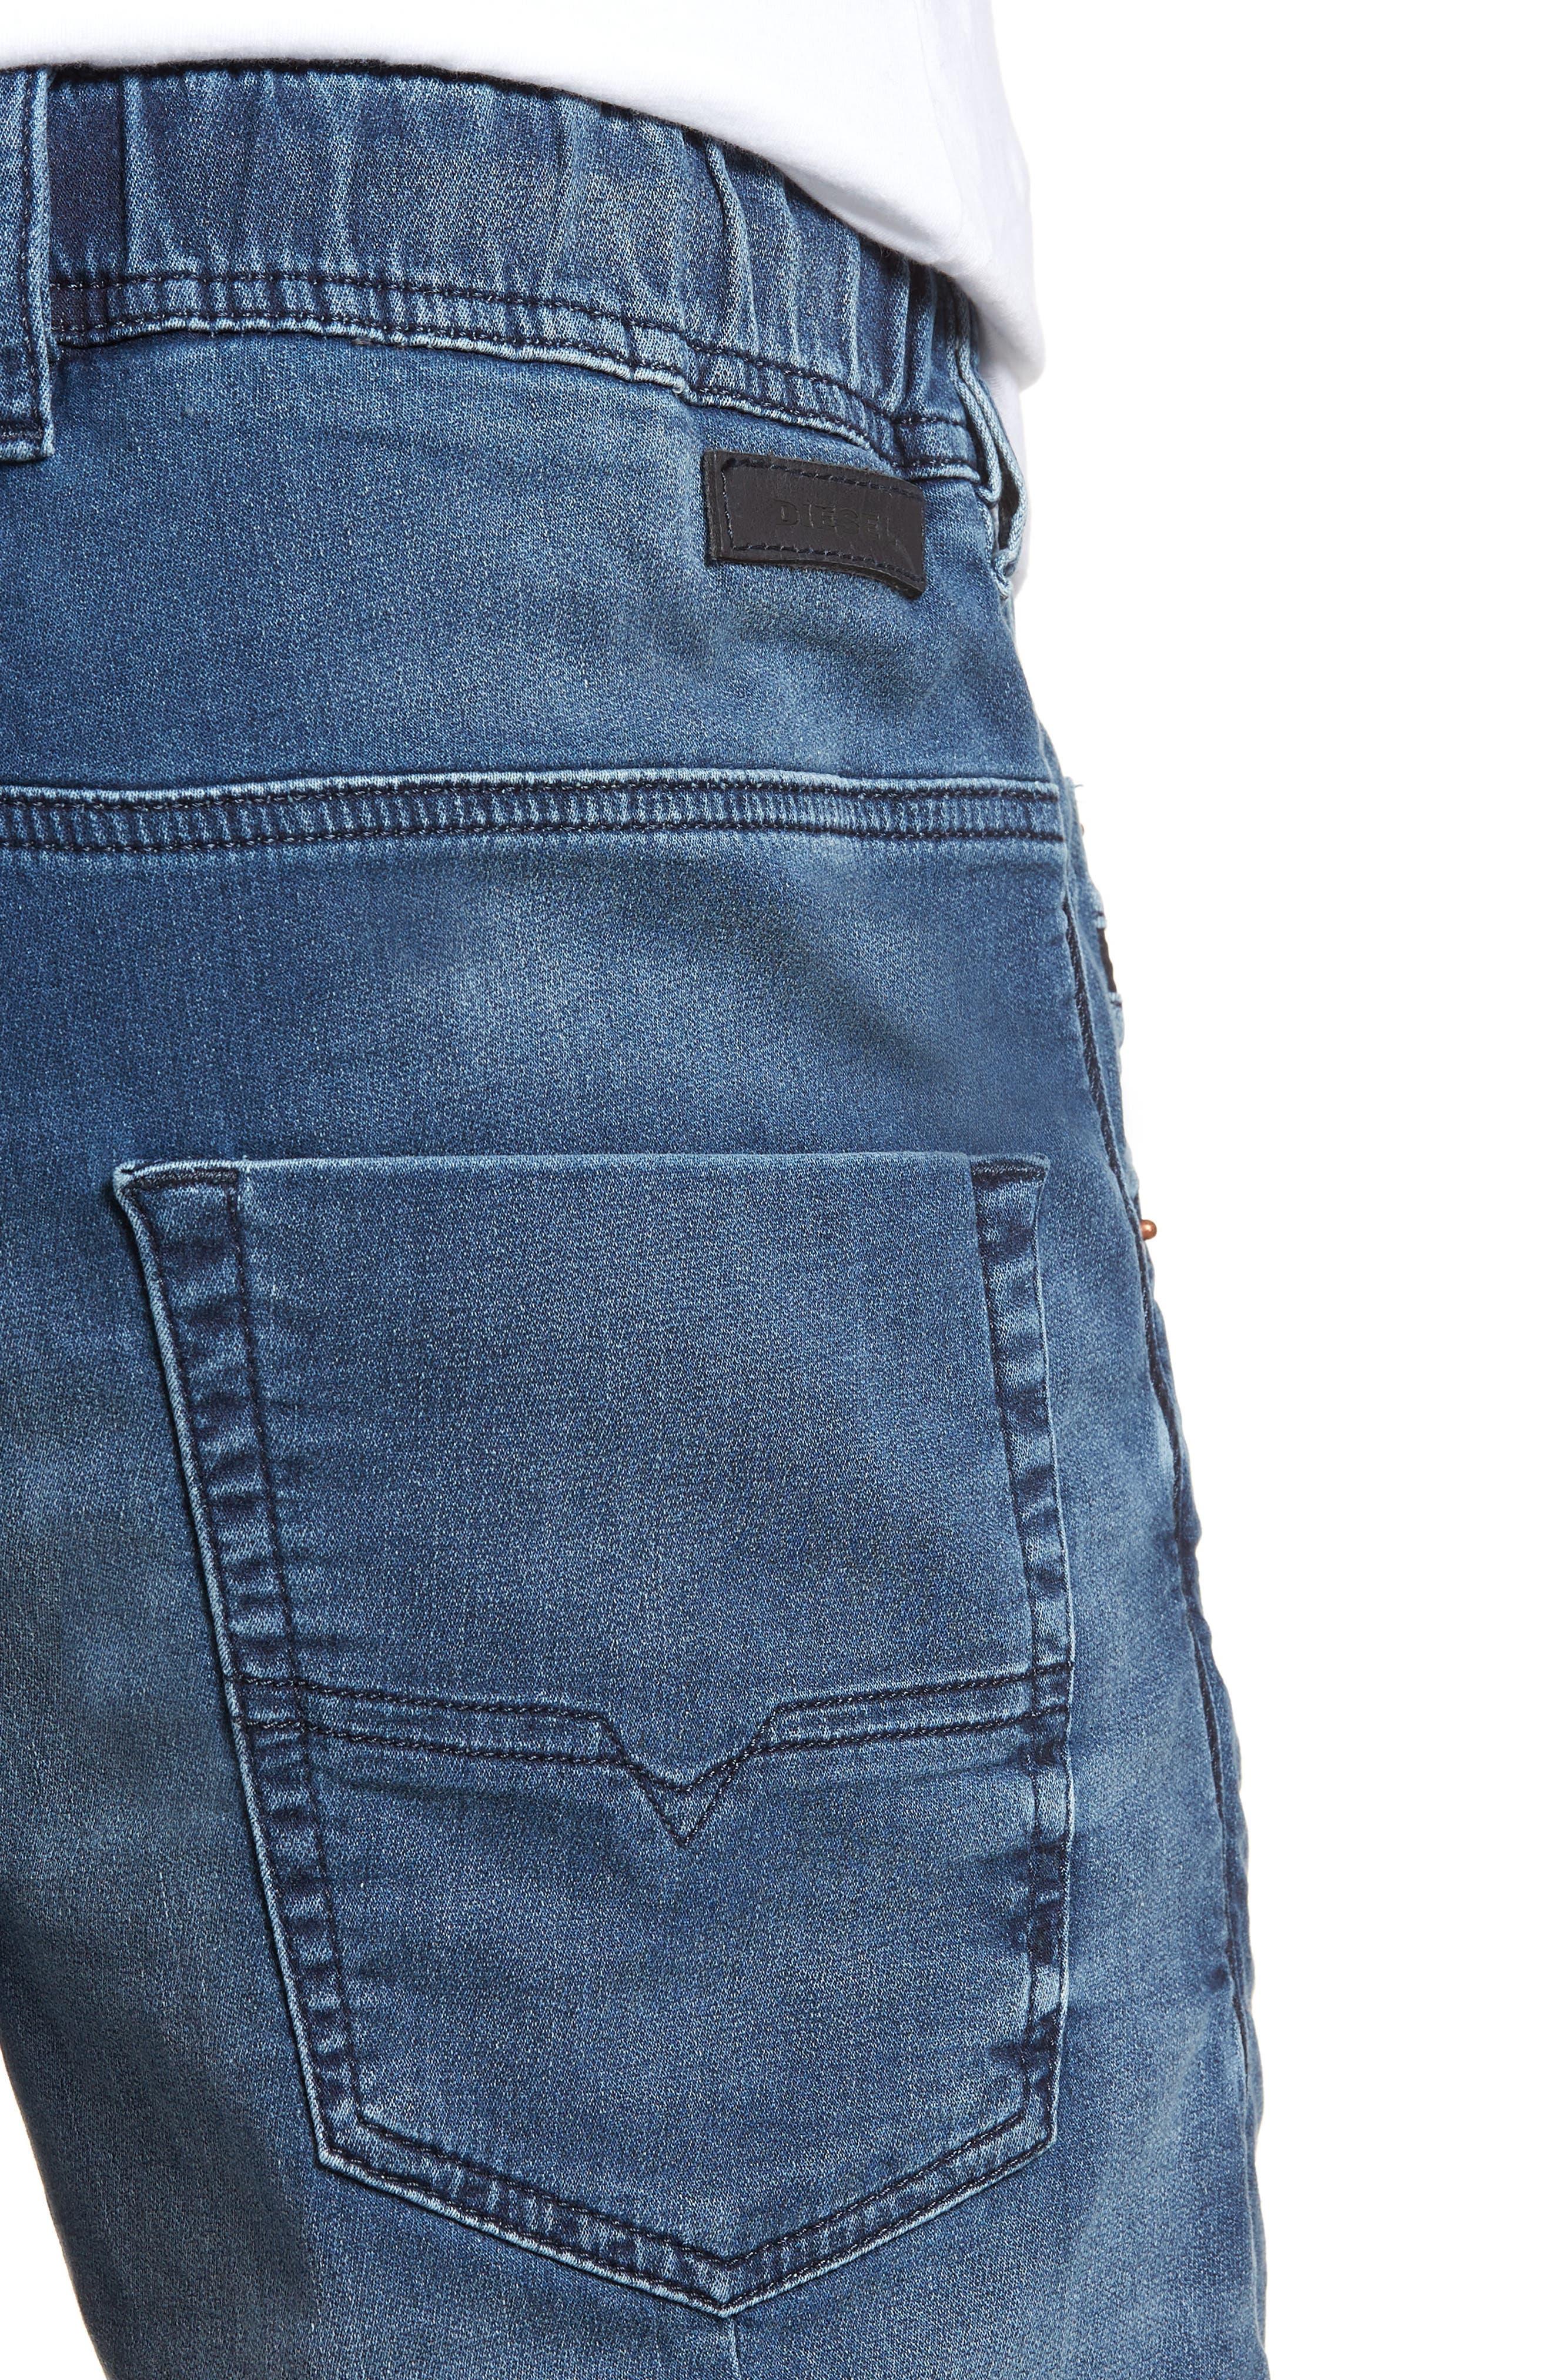 Krooshort Denim Shorts,                             Alternate thumbnail 4, color,                             0687C